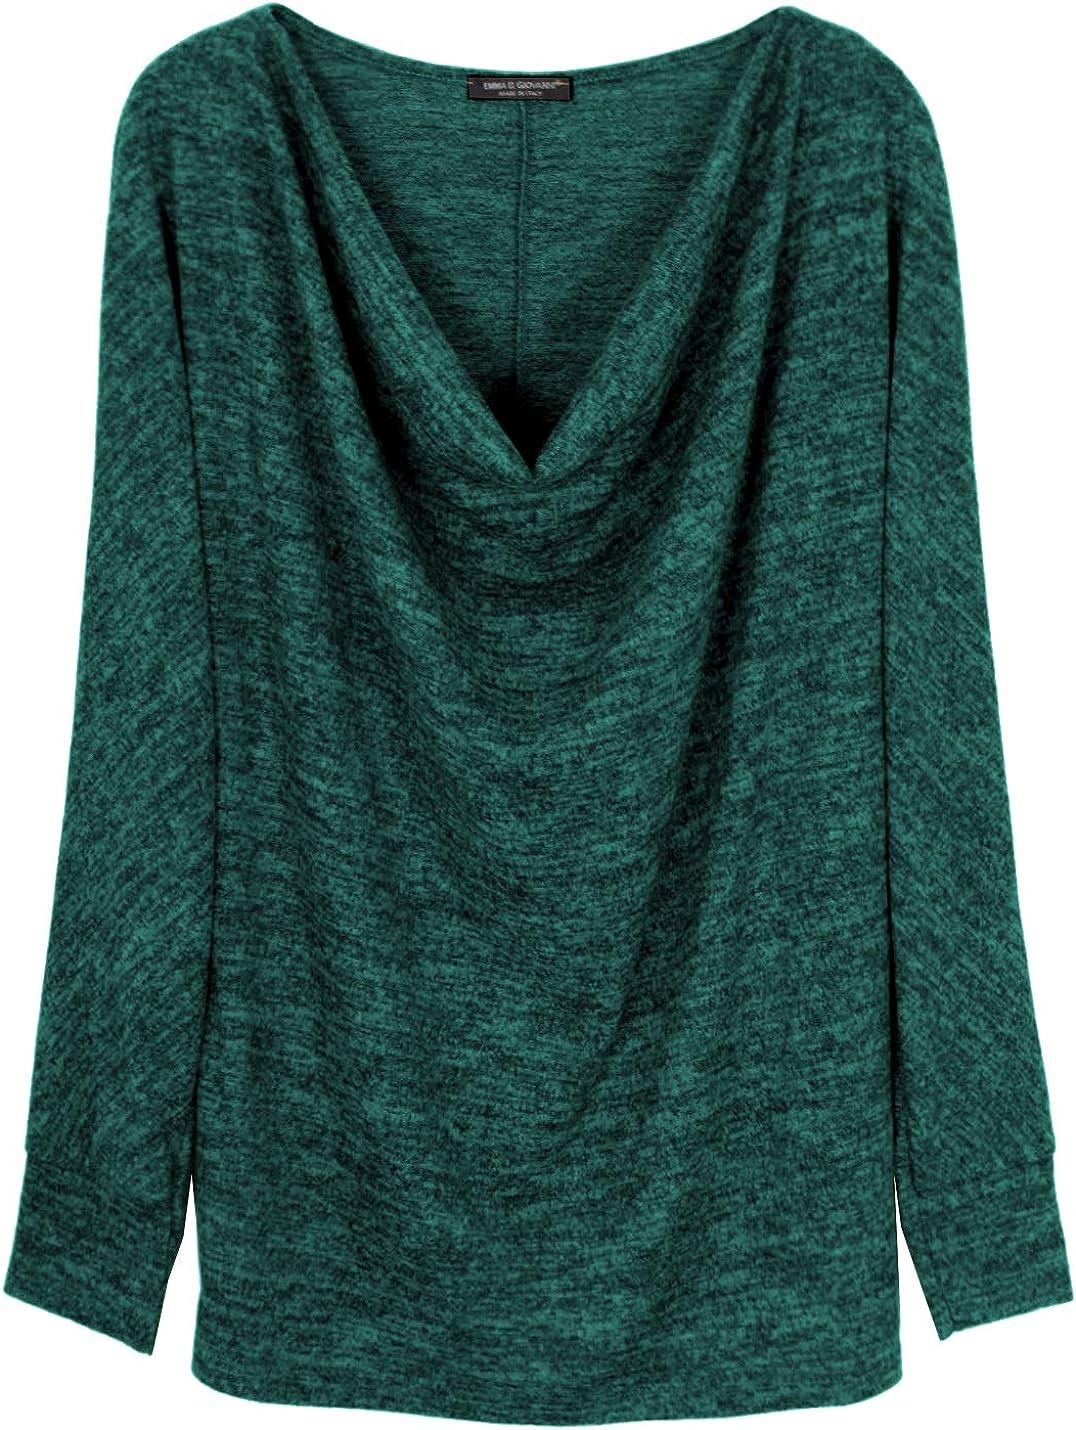 Made In Italy Oversized Oberteile Pullover Wasserfallausschnitt - Emma /& Giovanni - Damen